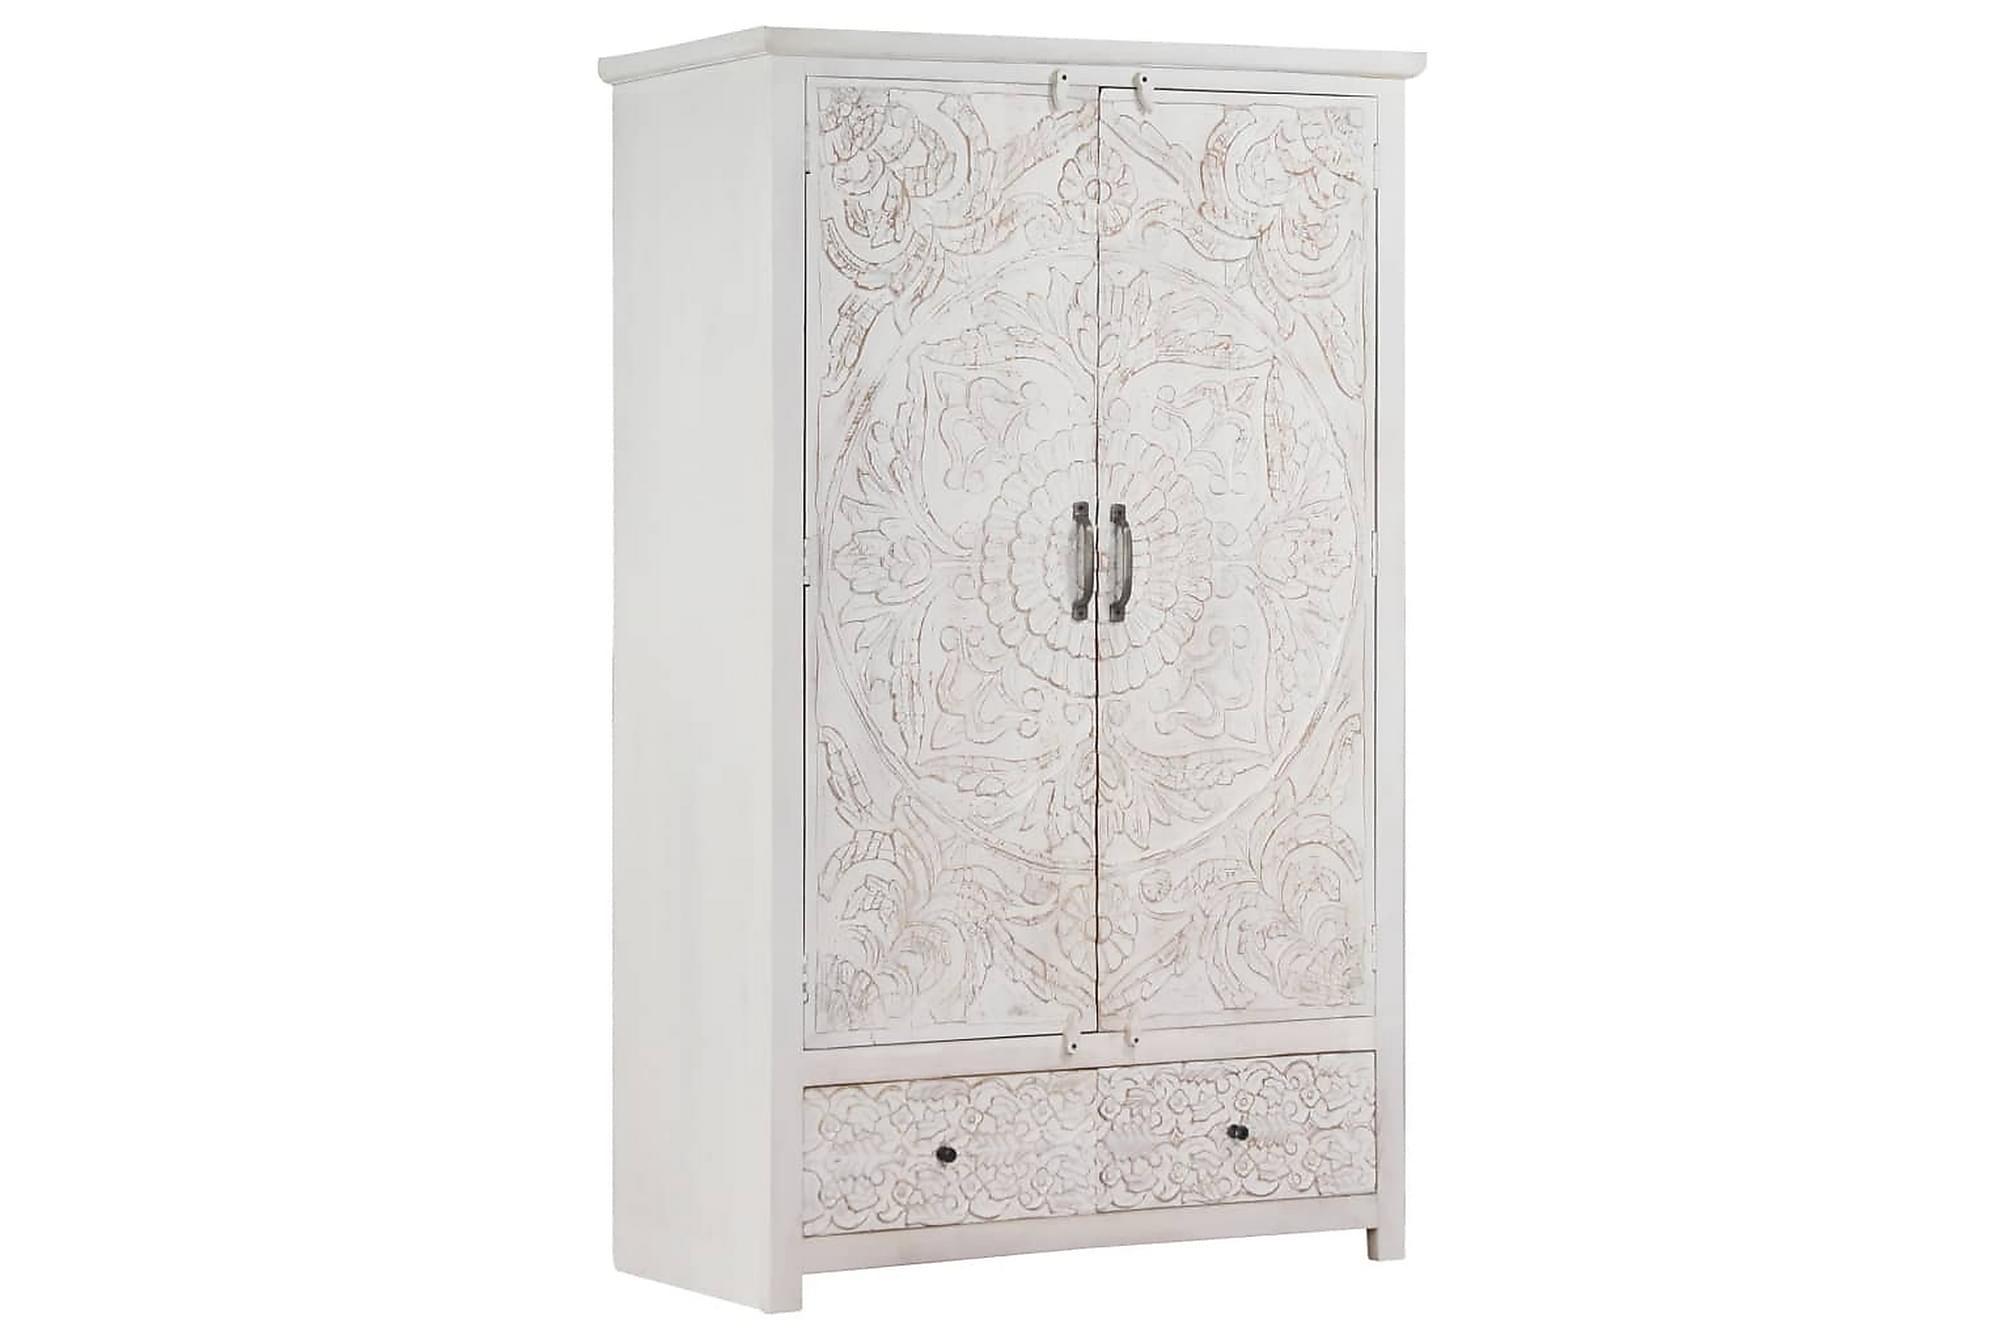 Garderob handgjord vit 110x56x183 cm massivt akaciaträ